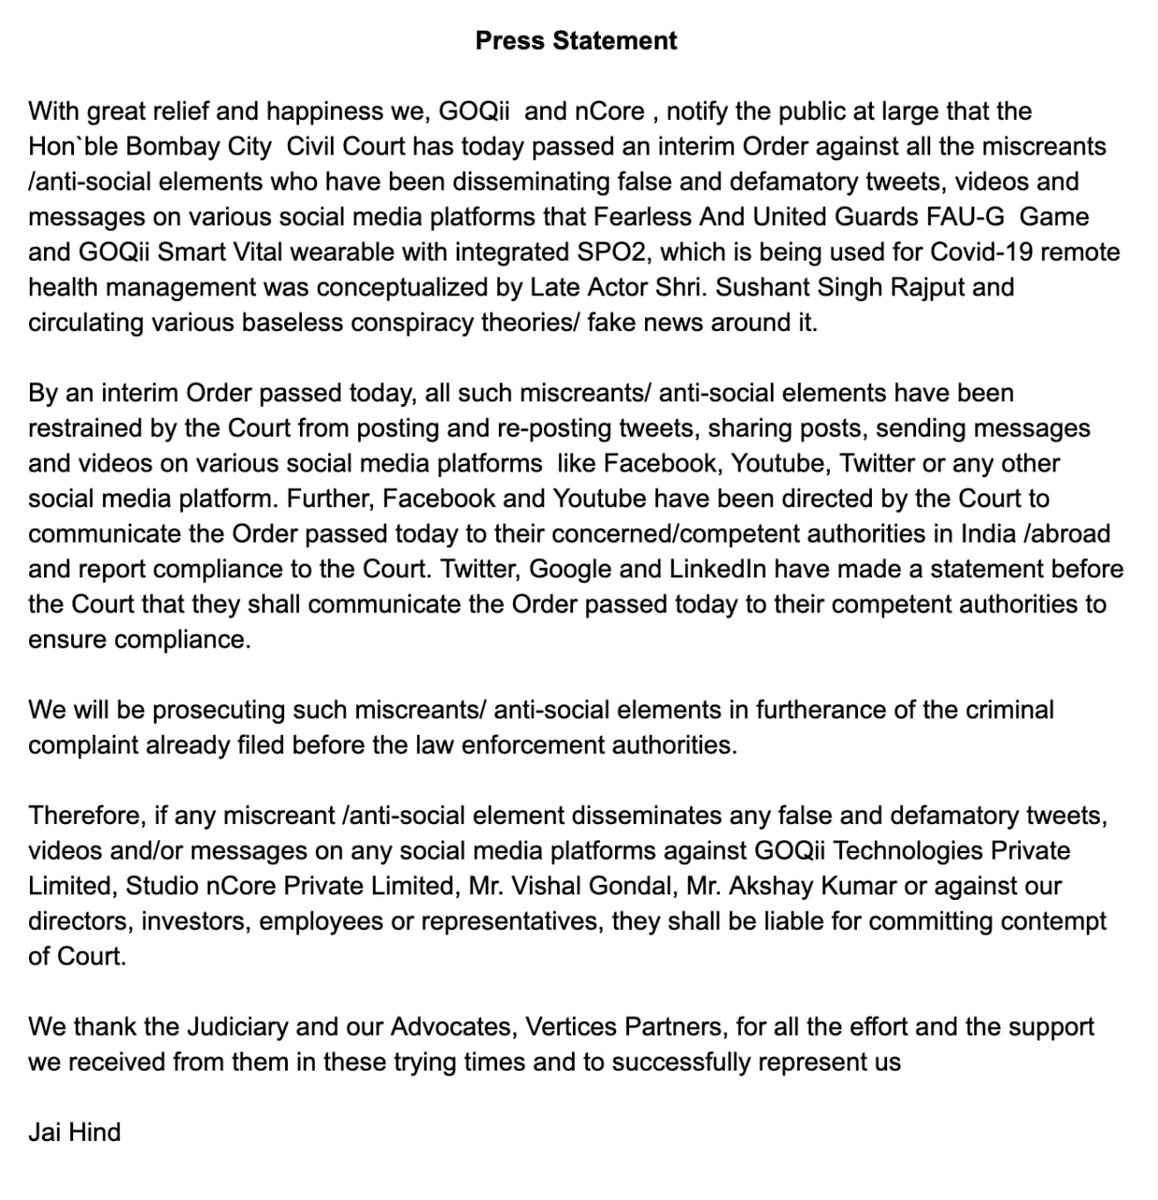 Important Press Statement  Interim order passed by Hon`ble Bombay City  Civil Court   @akshaykumar @vishalgondal @GOQii #JaiHind